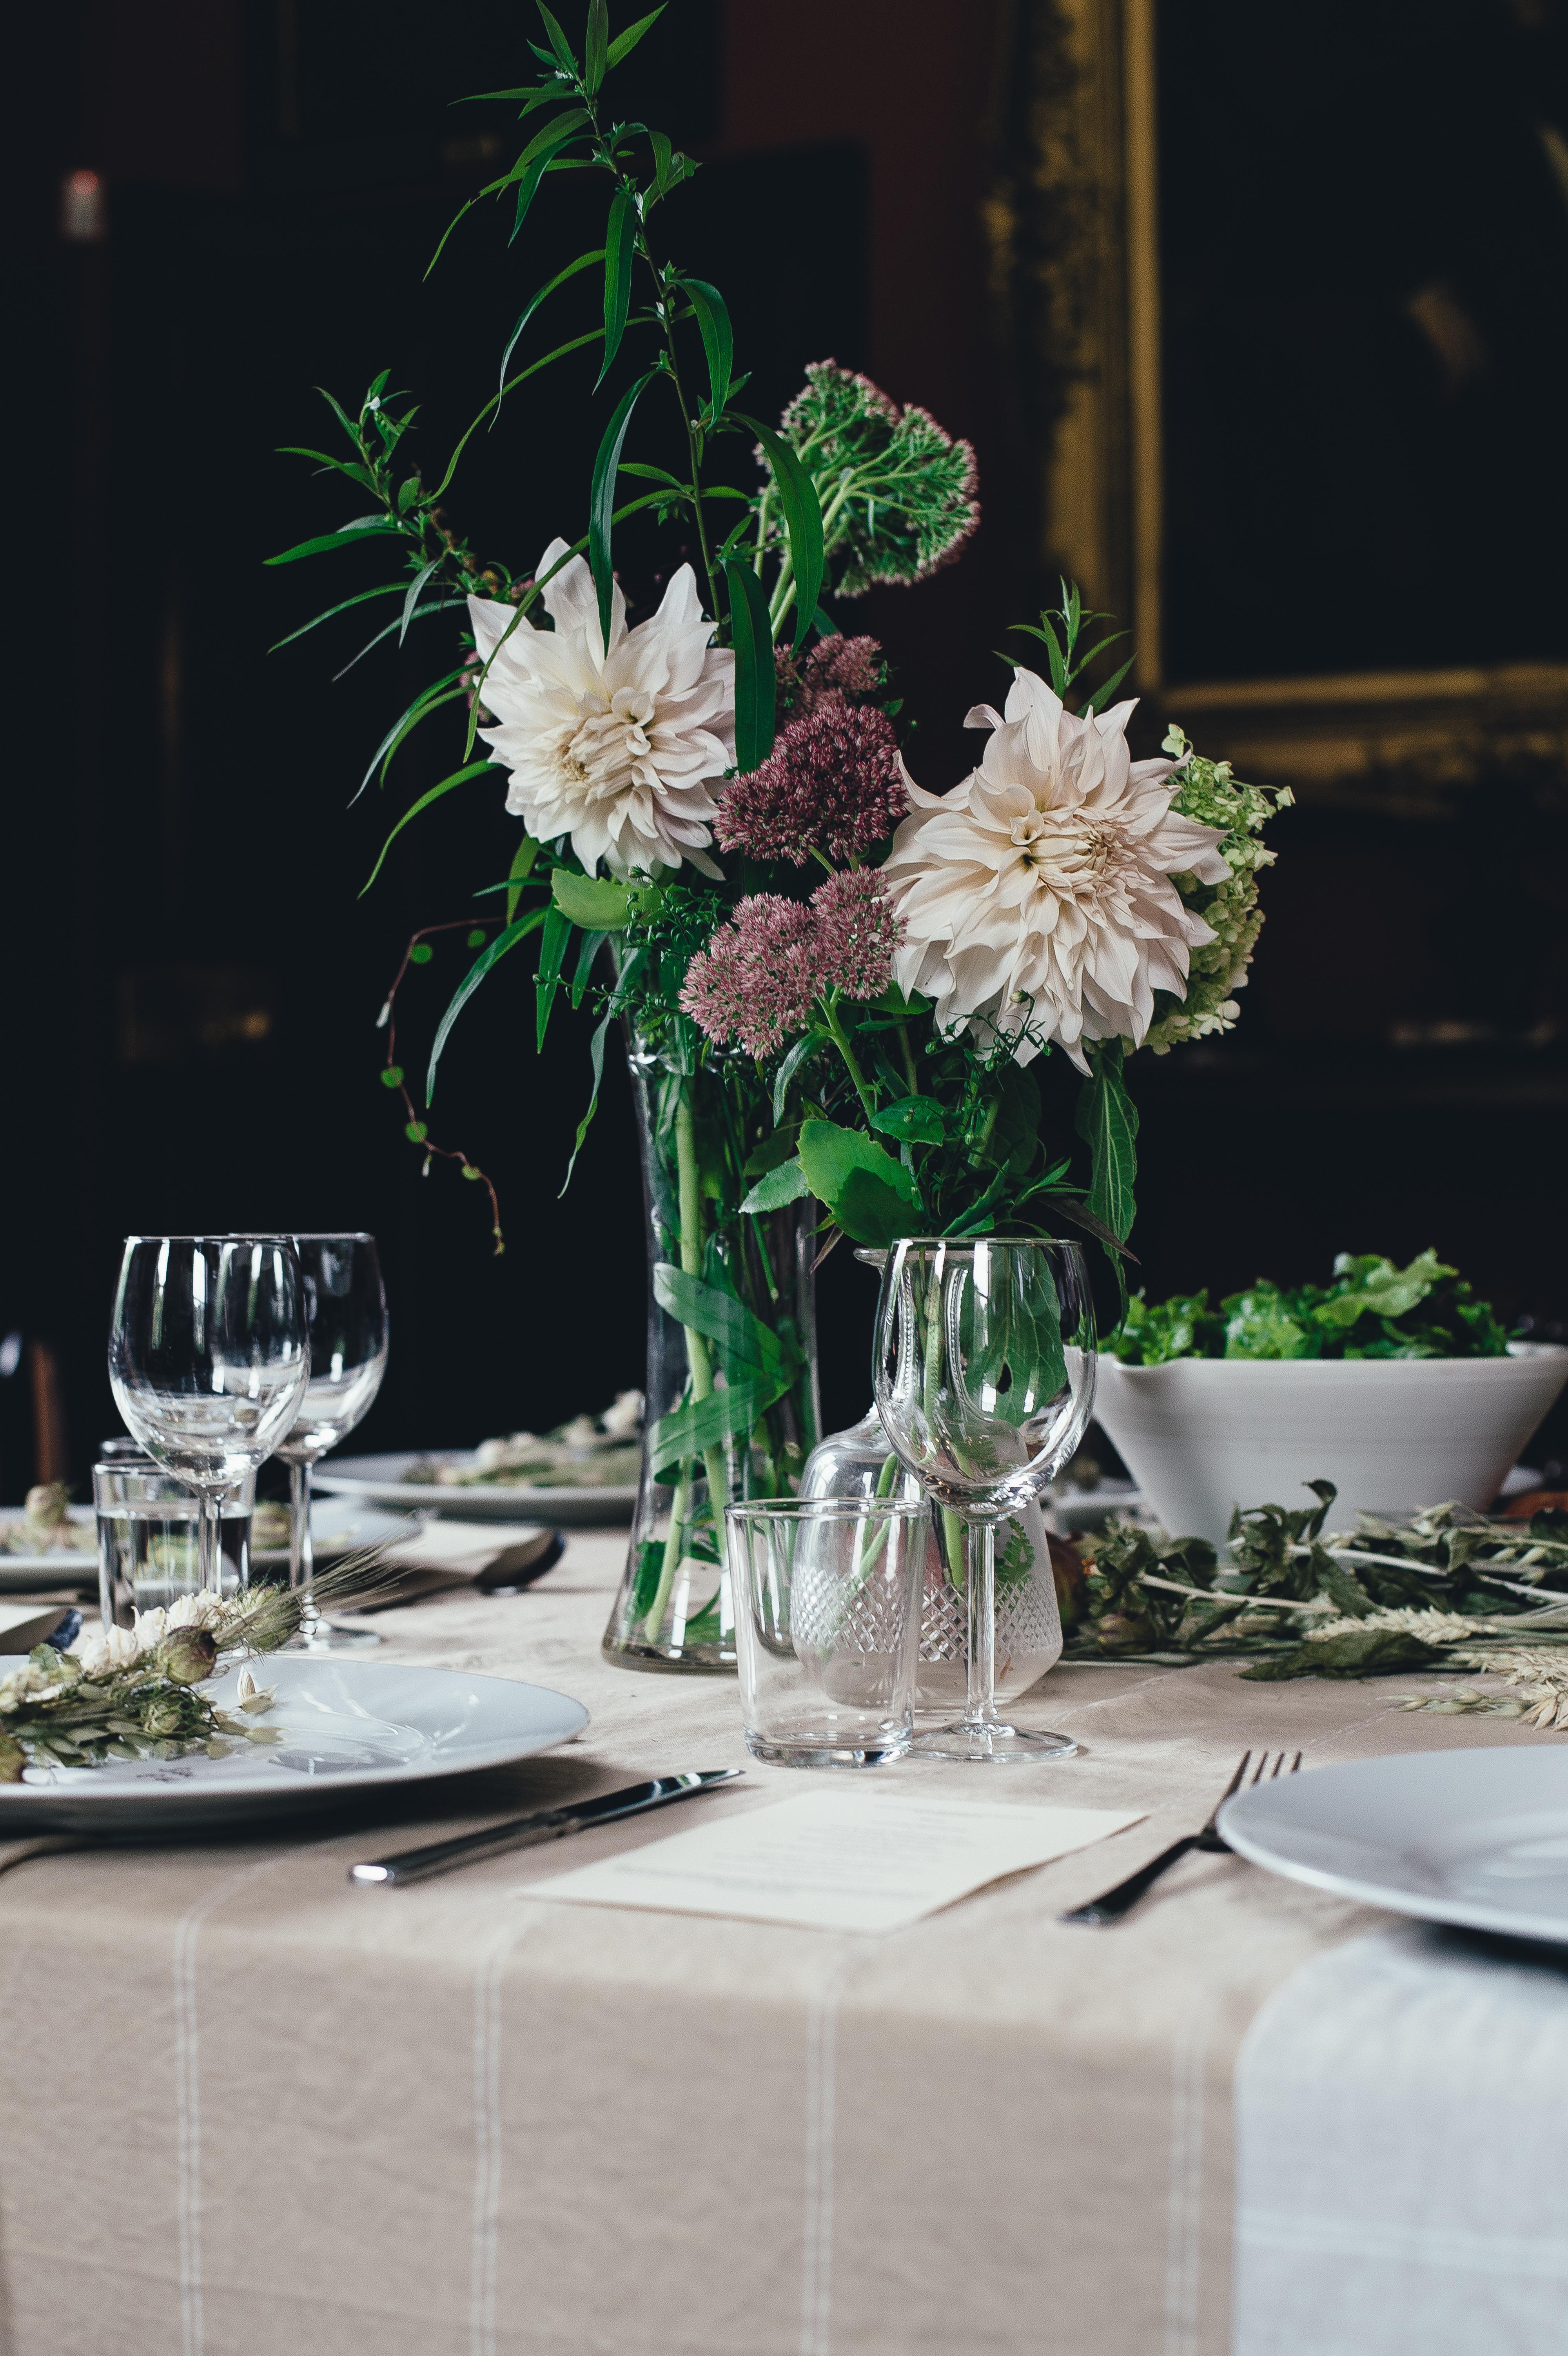 Table Cutlery White Flower Gl Restaurant Meal Lighting Wedding Interior Design Dahlia Ceremony Floristry Dining